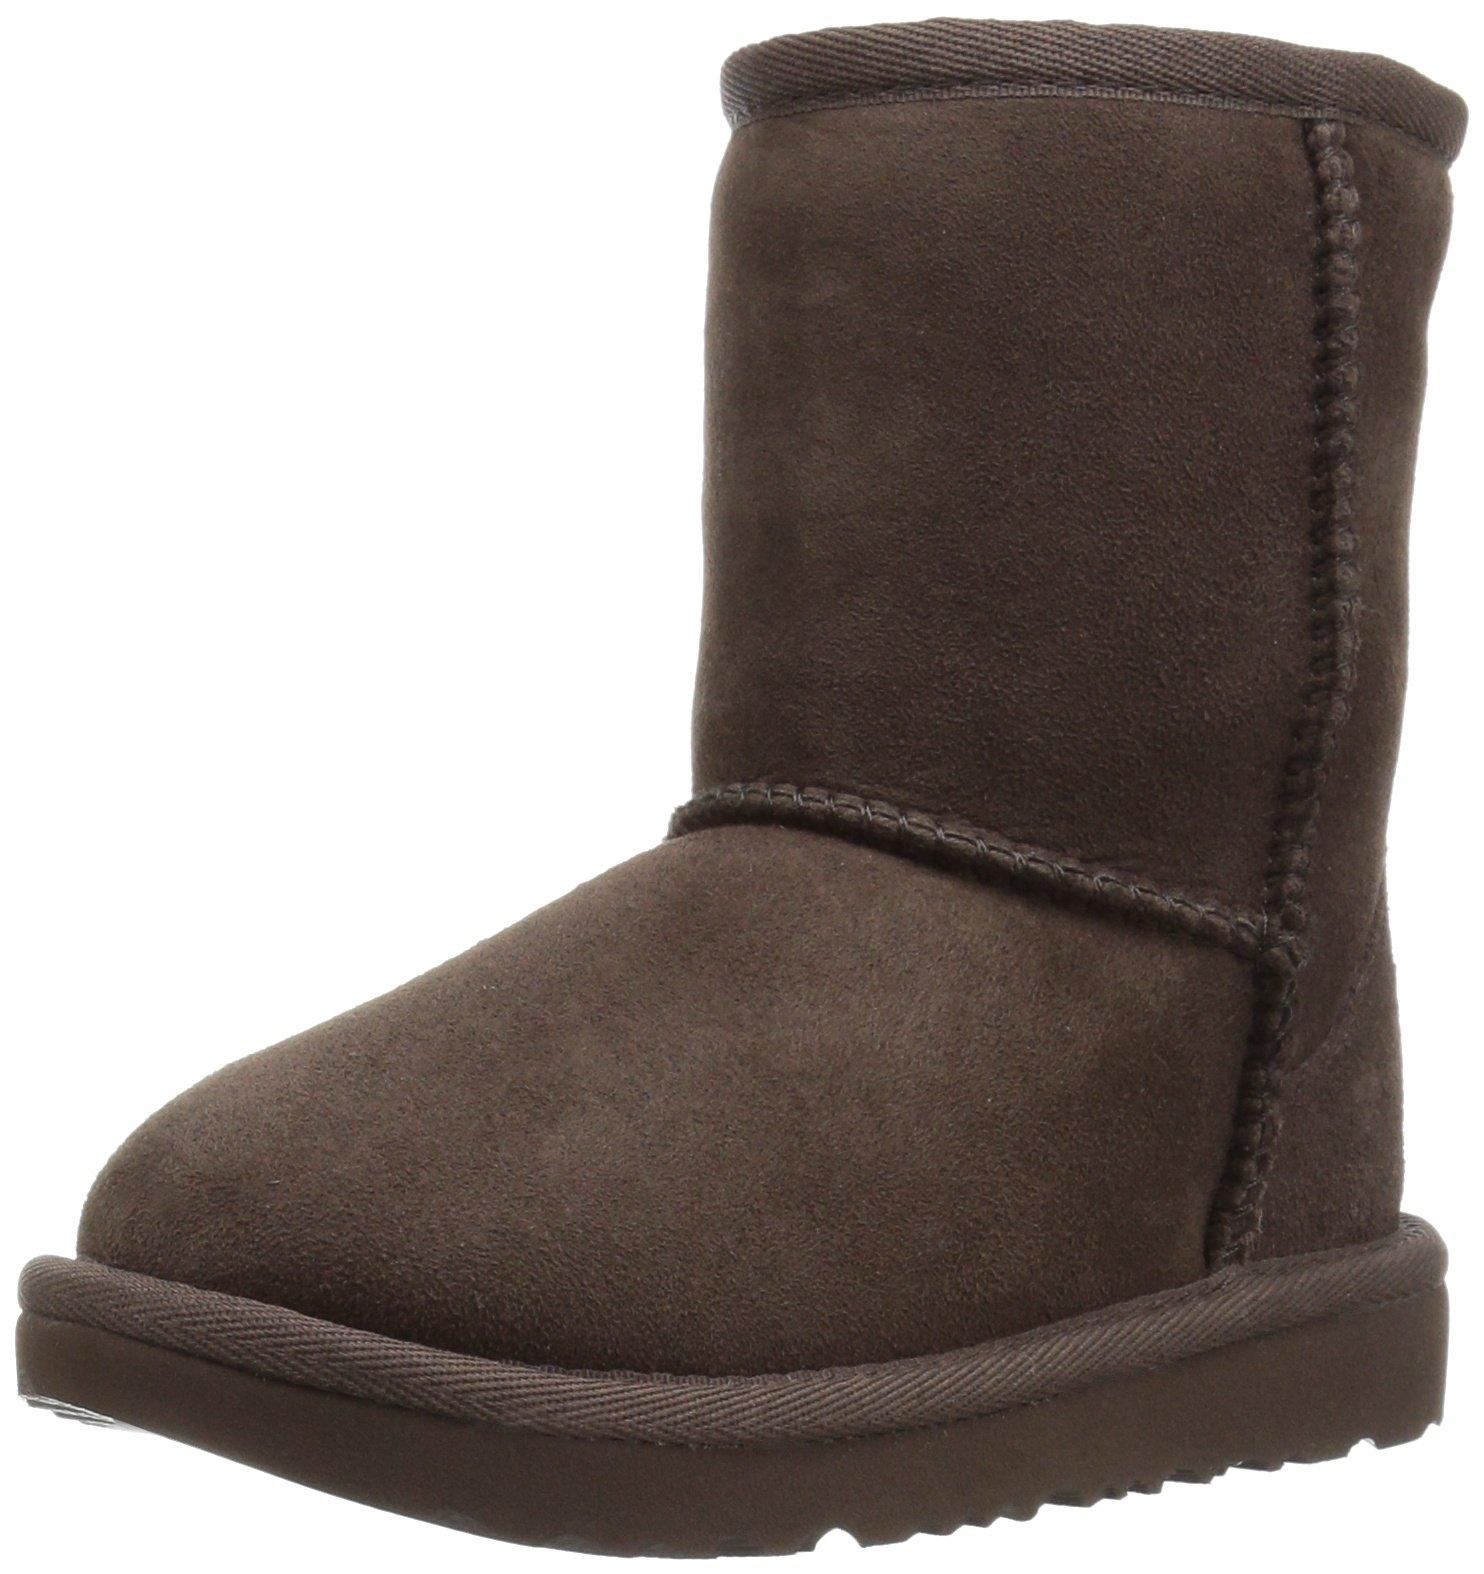 UGG Kids T Classic II Boot, Chocolate, 11 M US Little Kid